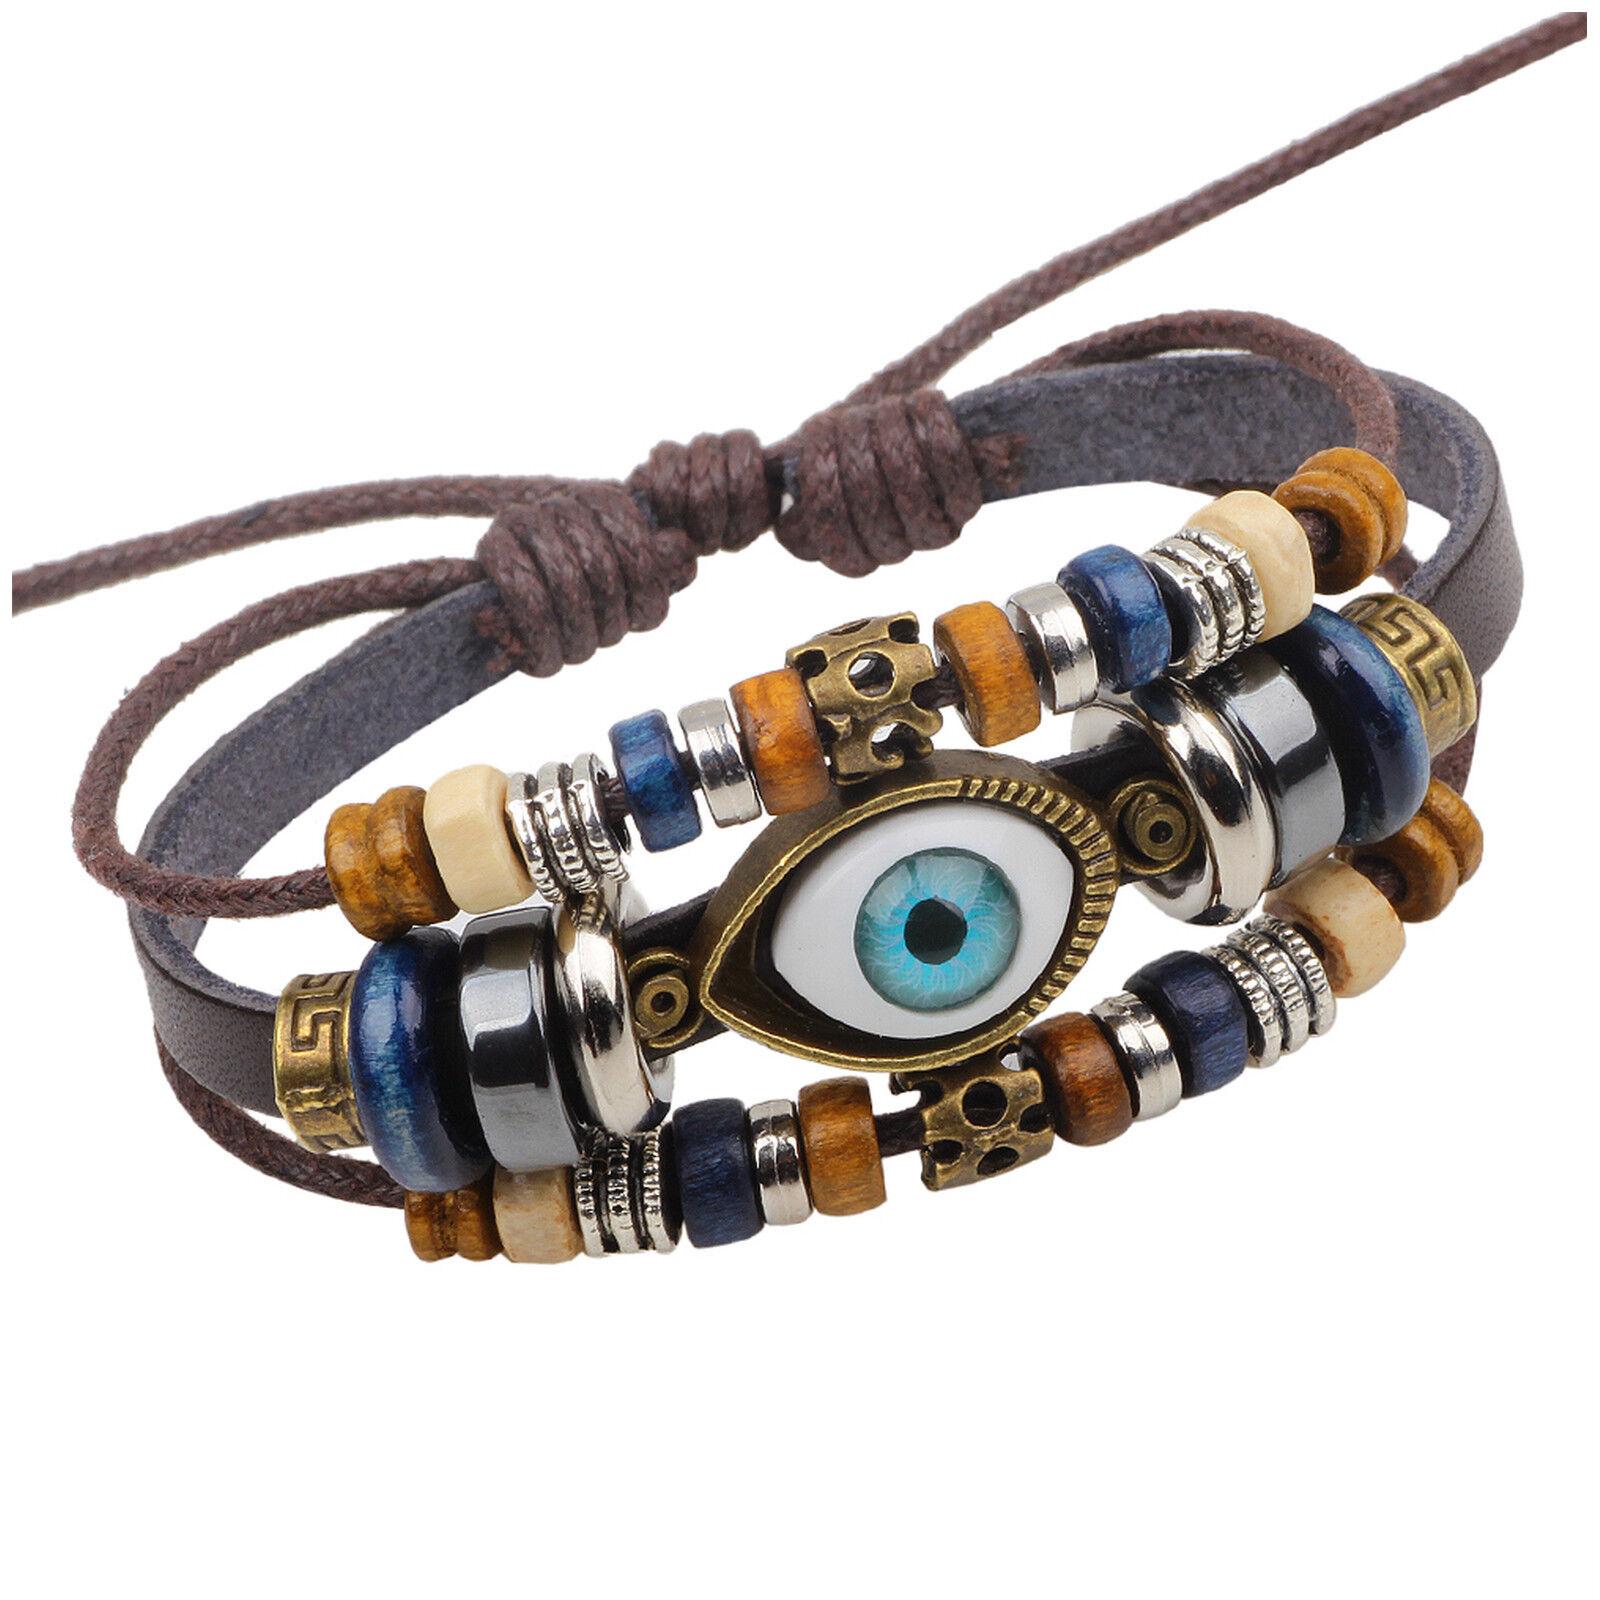 Tribal Evil Eye and Bead Charms Unisex Men Women Leather Wristband Bracelet Bracelets